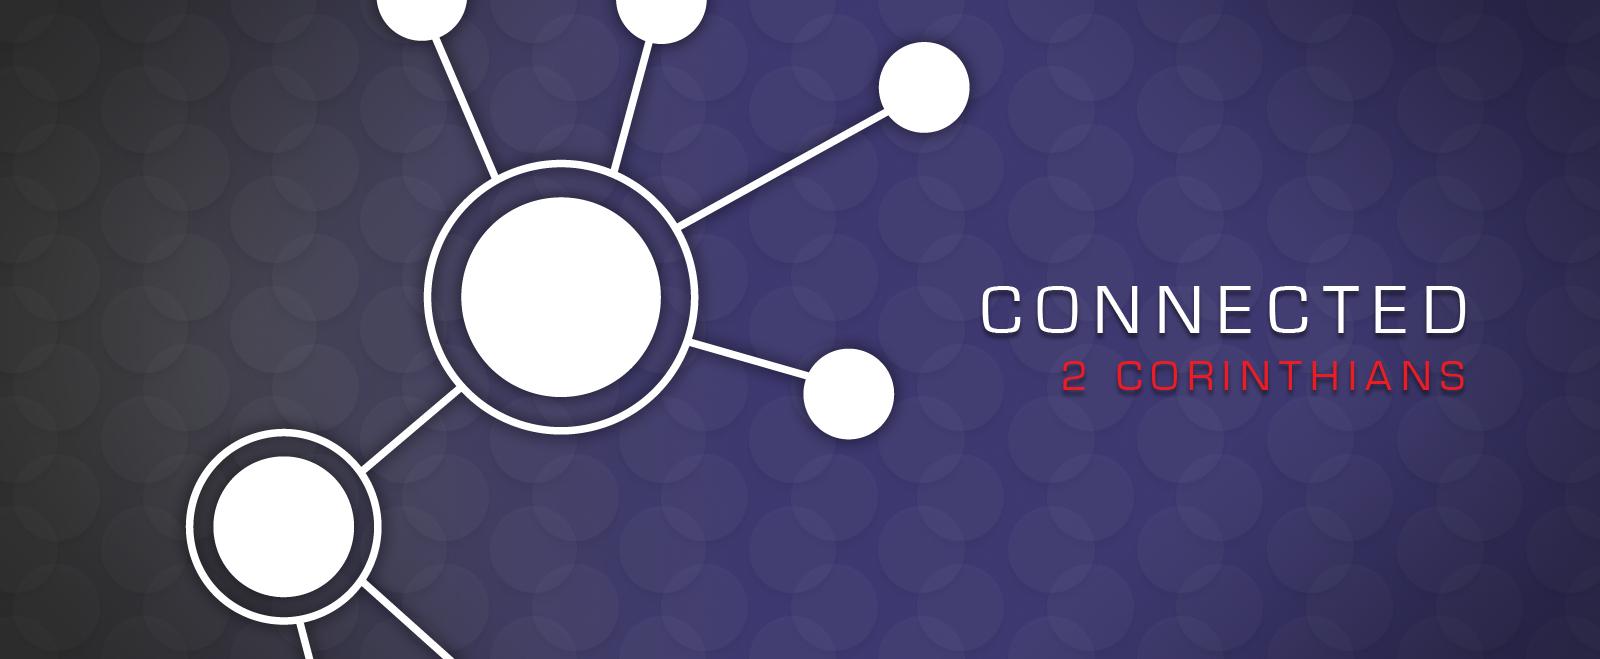 Connected_WebImageFinal